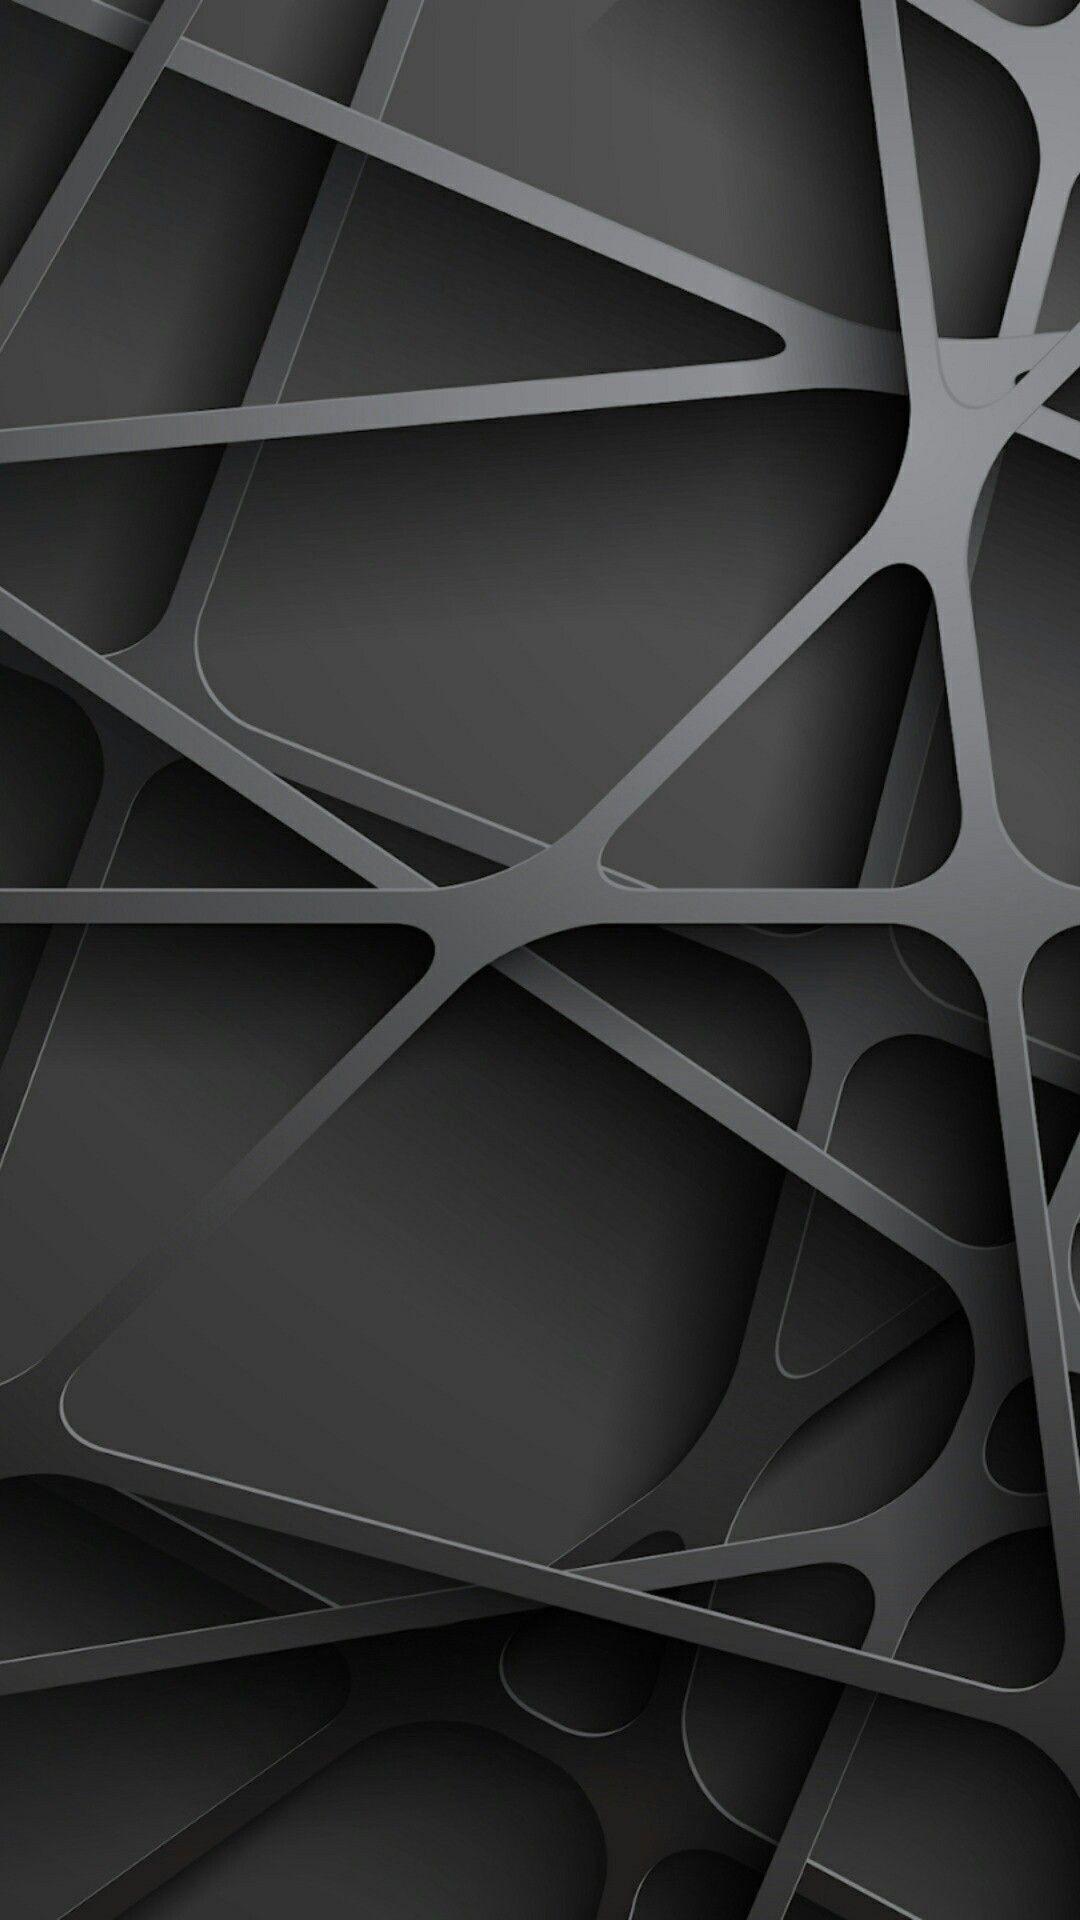 Res: 1080x1920, Live Wallpaper App for iPhone New Grey Geometric Wallpaper